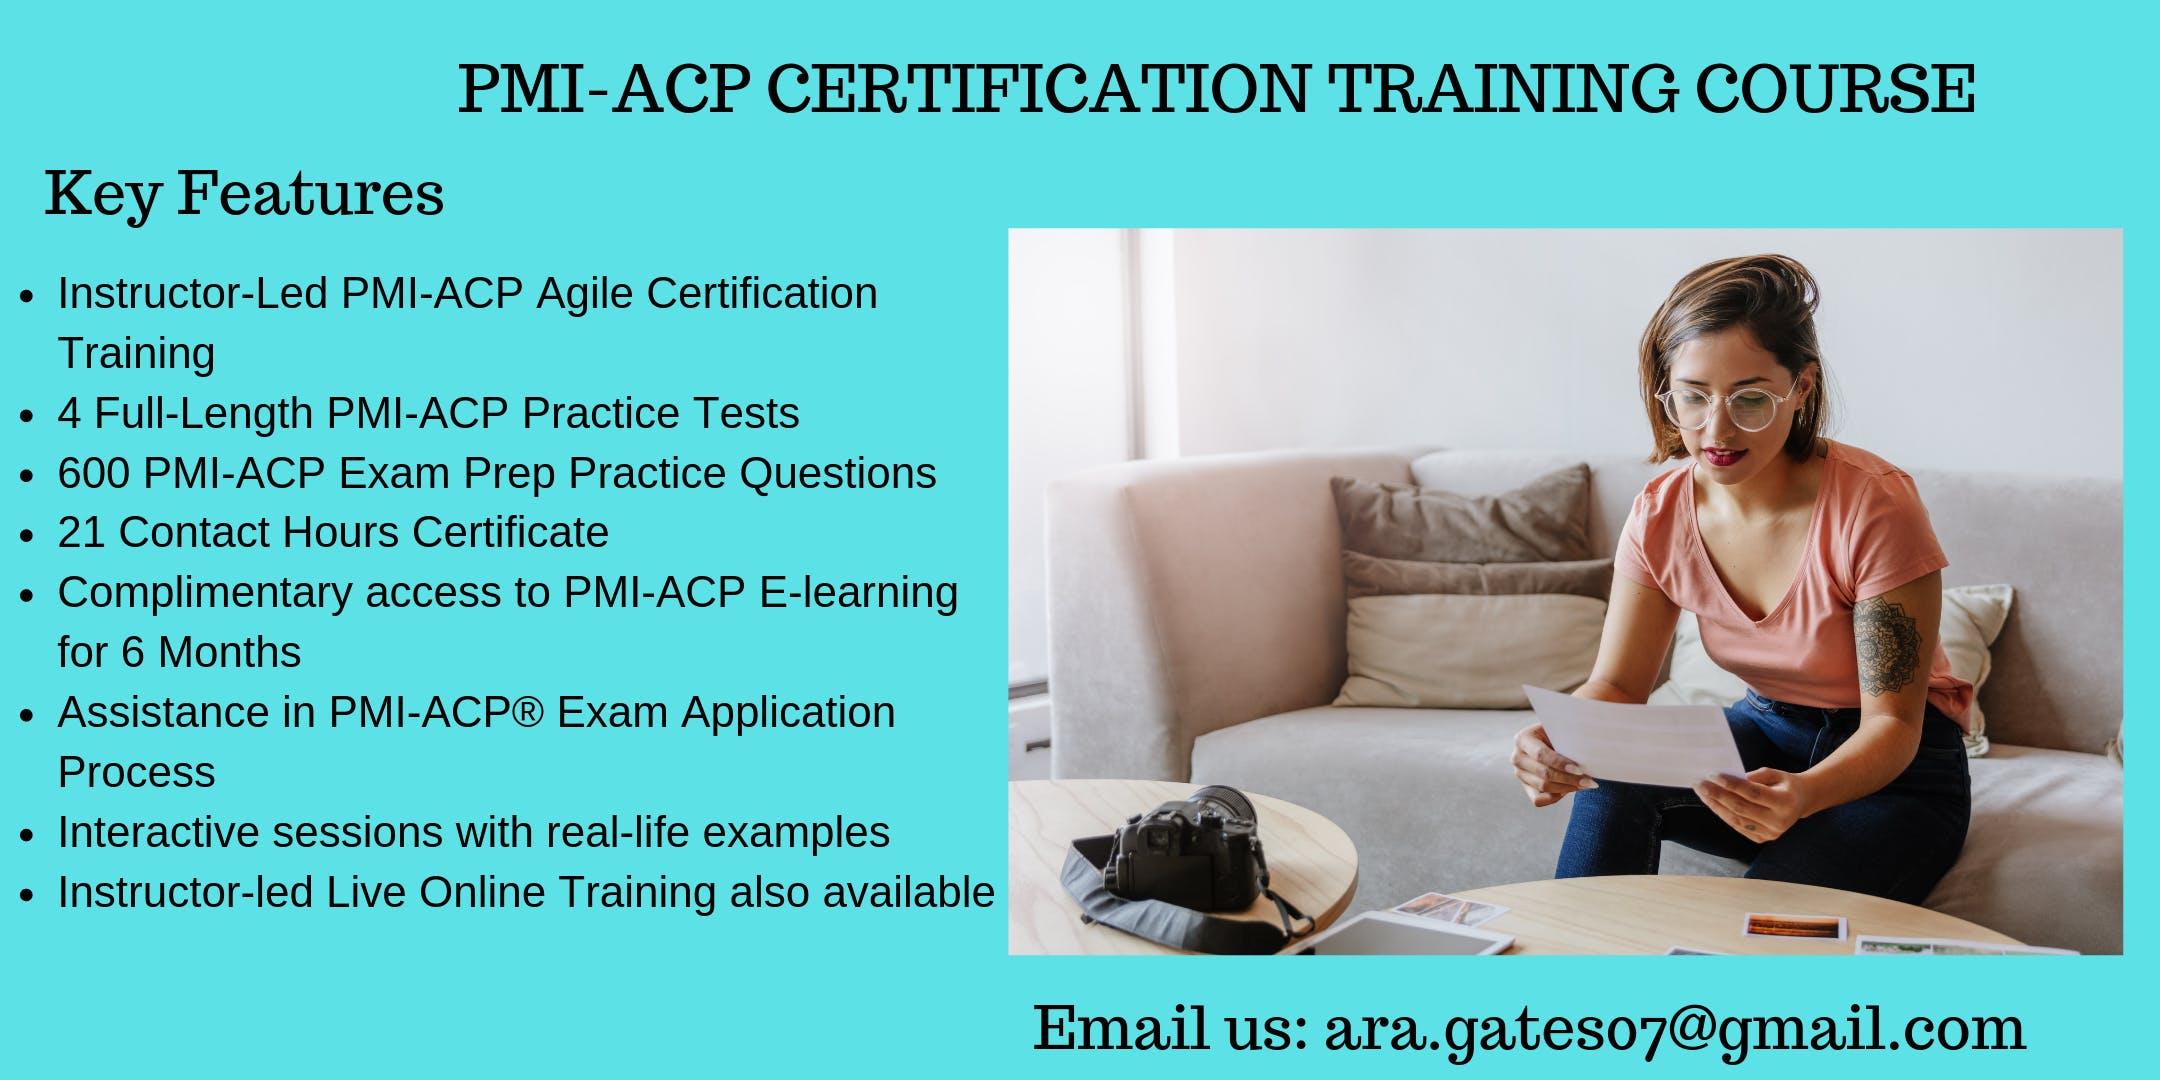 PMI-ACP Exam Prep Course in Parkersburg, WV